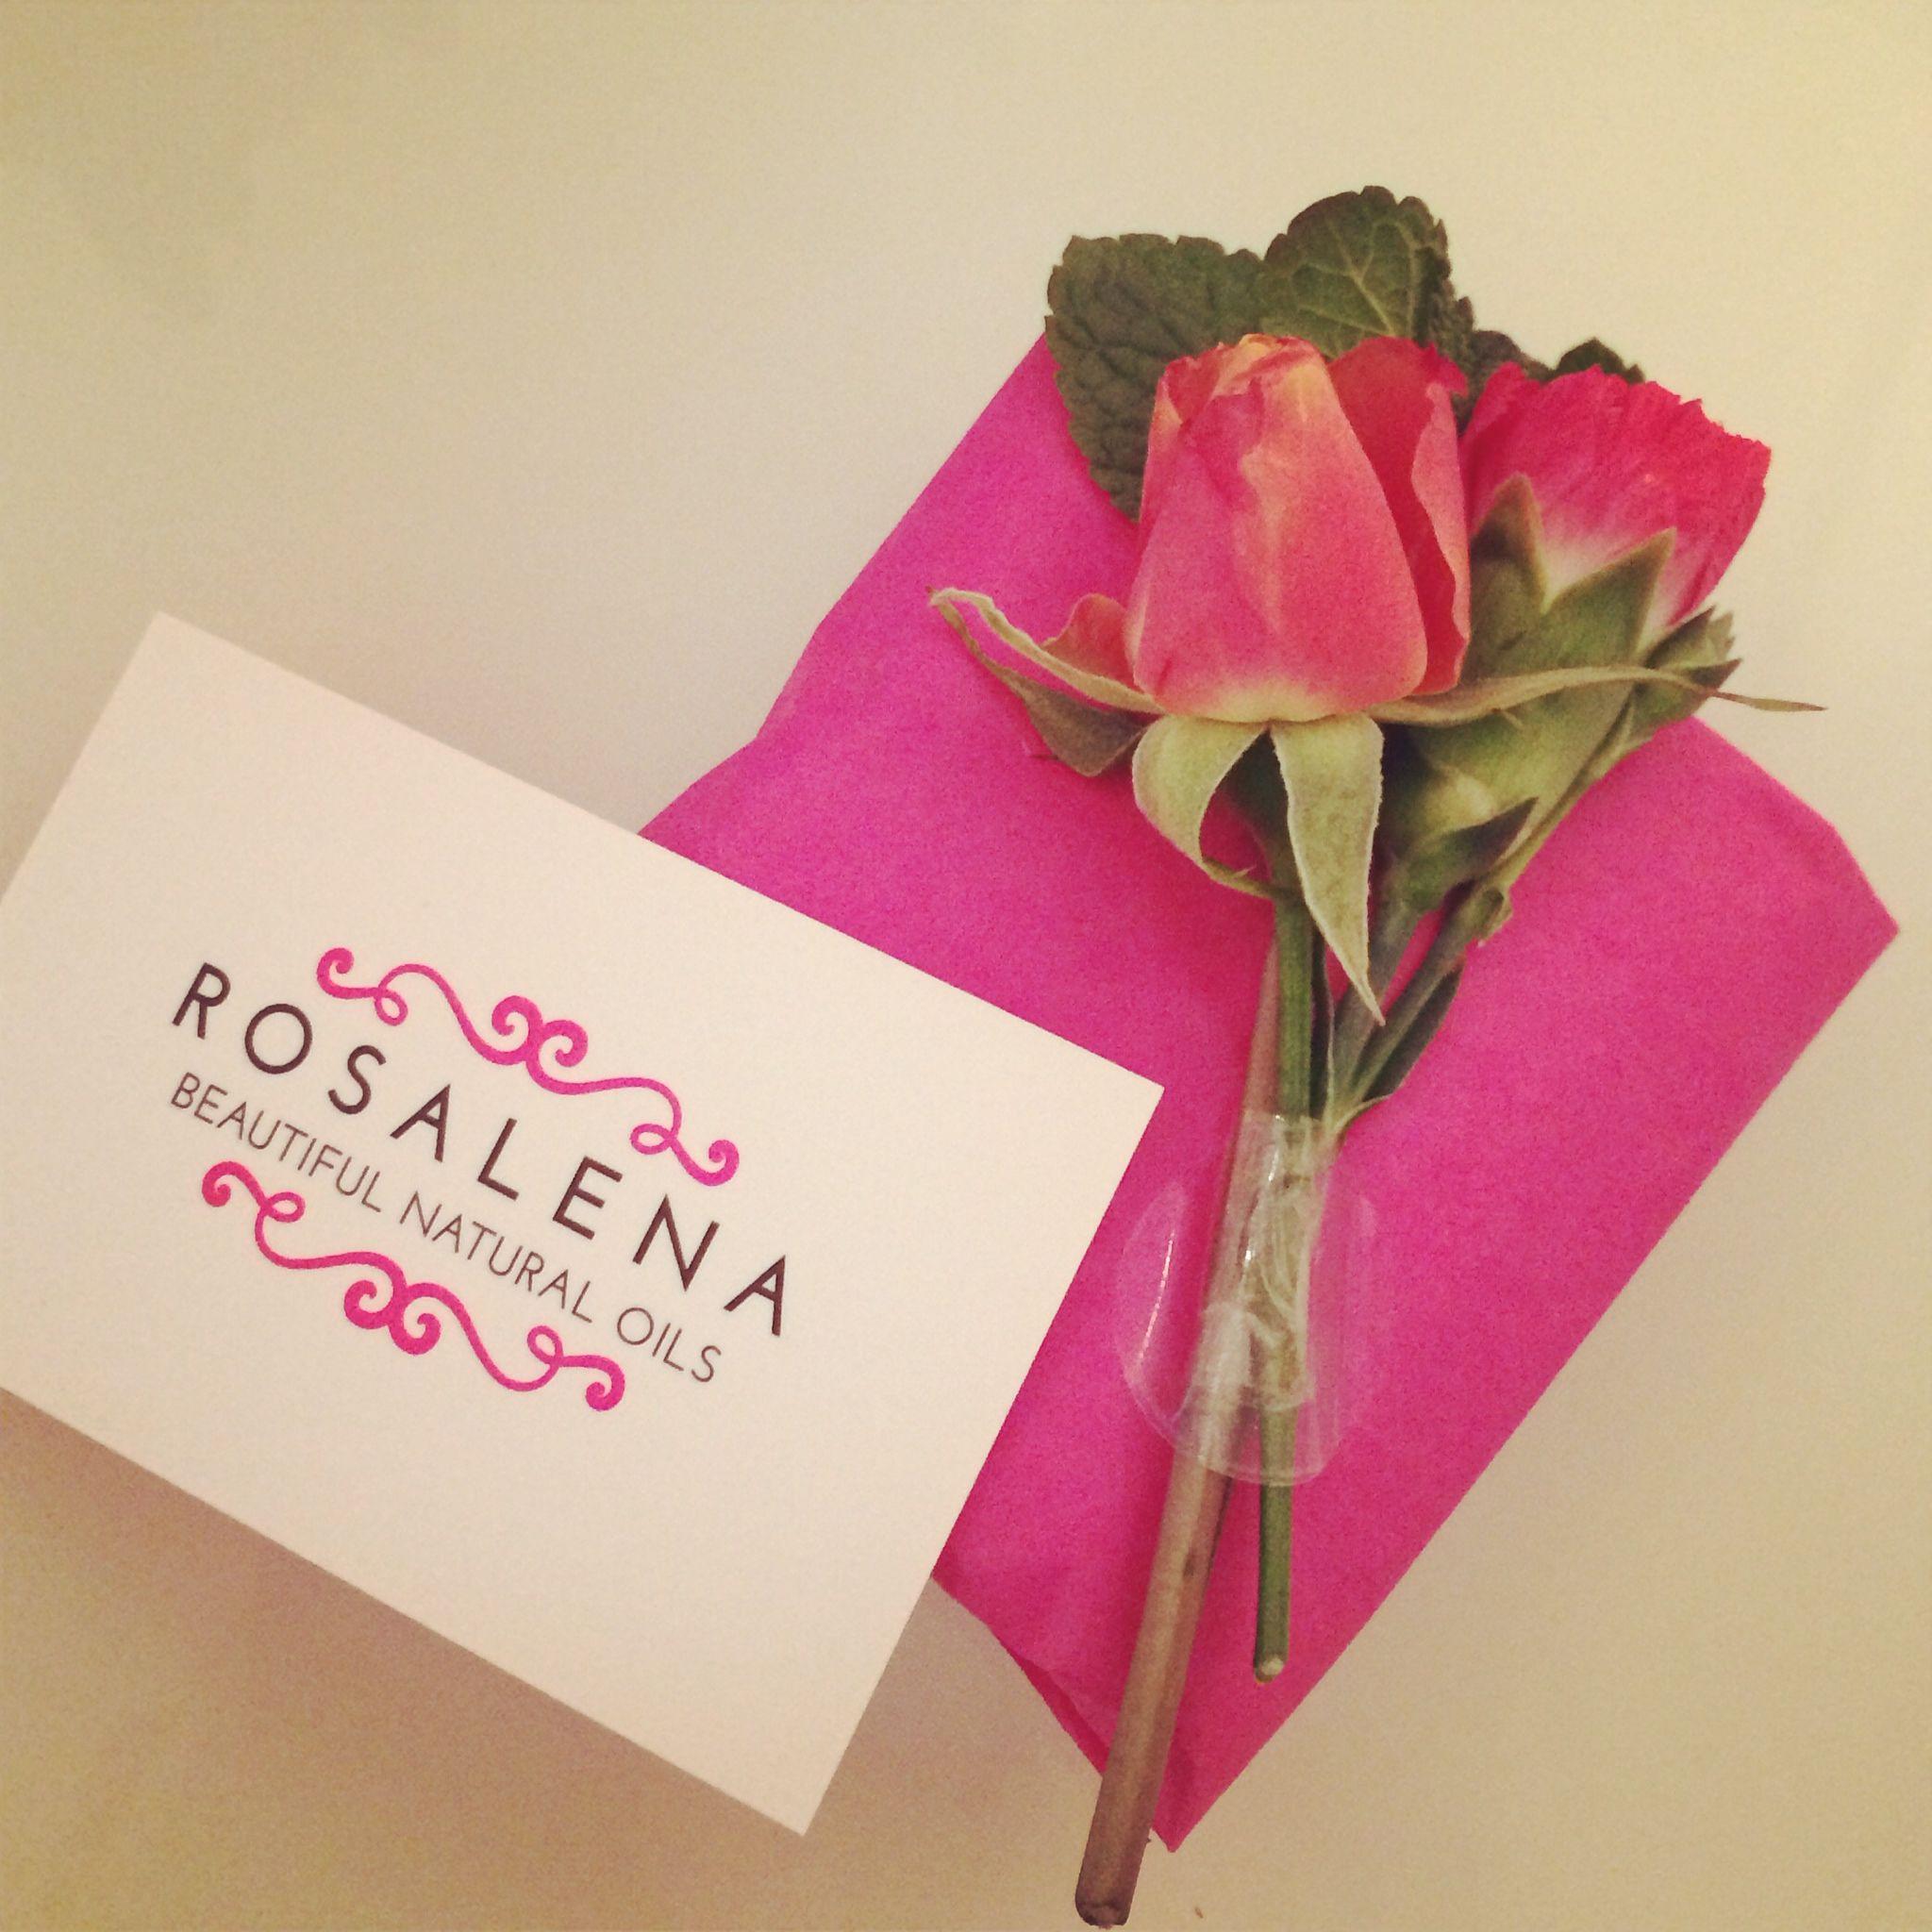 Sample Rosalena   The Rosalena Experience   Pinterest